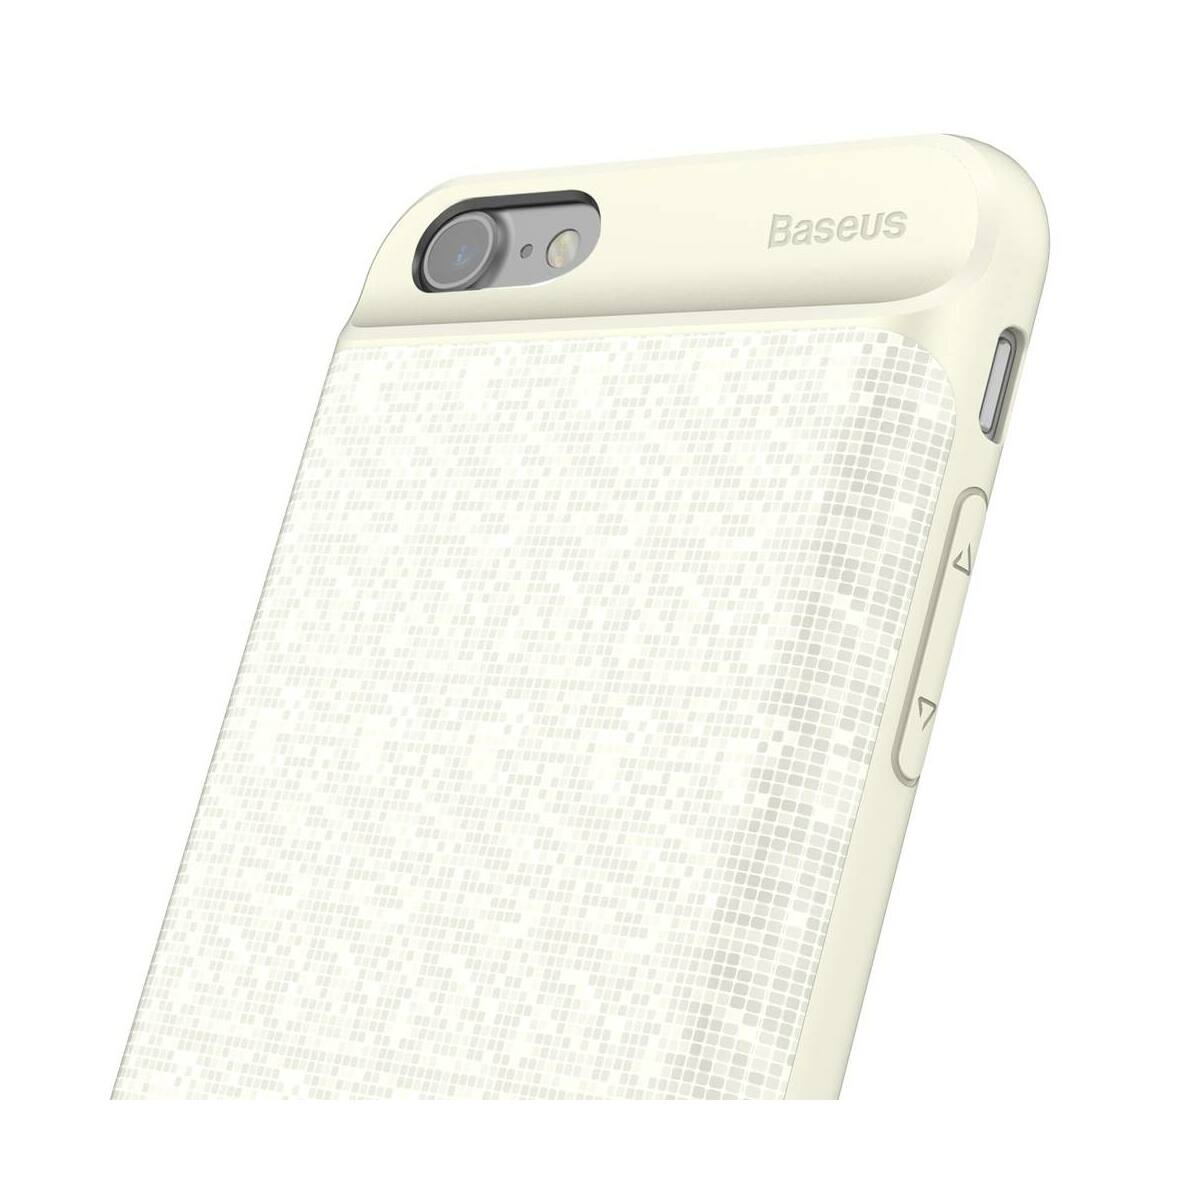 Baseus Power Bank tok, Plaid Backpack 2500 mAh iPhone 8/7, fehér (ACAPIPH7-BJ02)